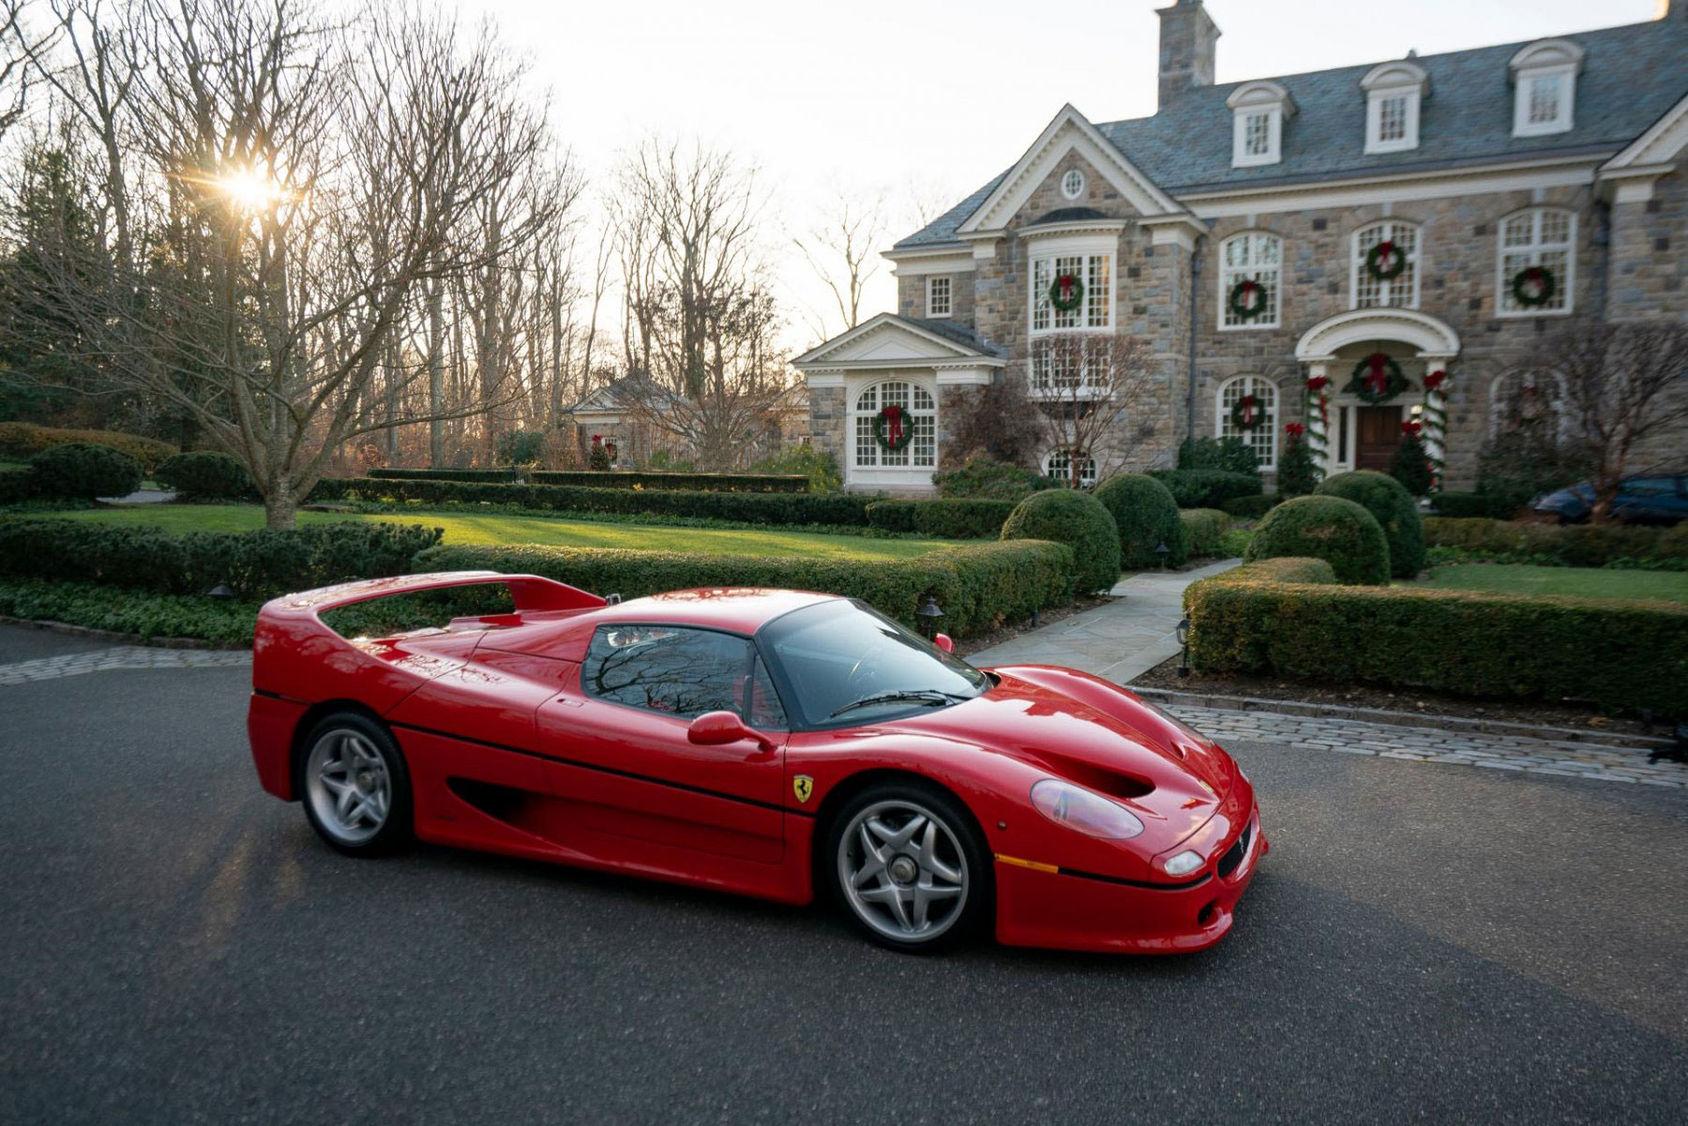 Buda hem en unik Ferrari F50